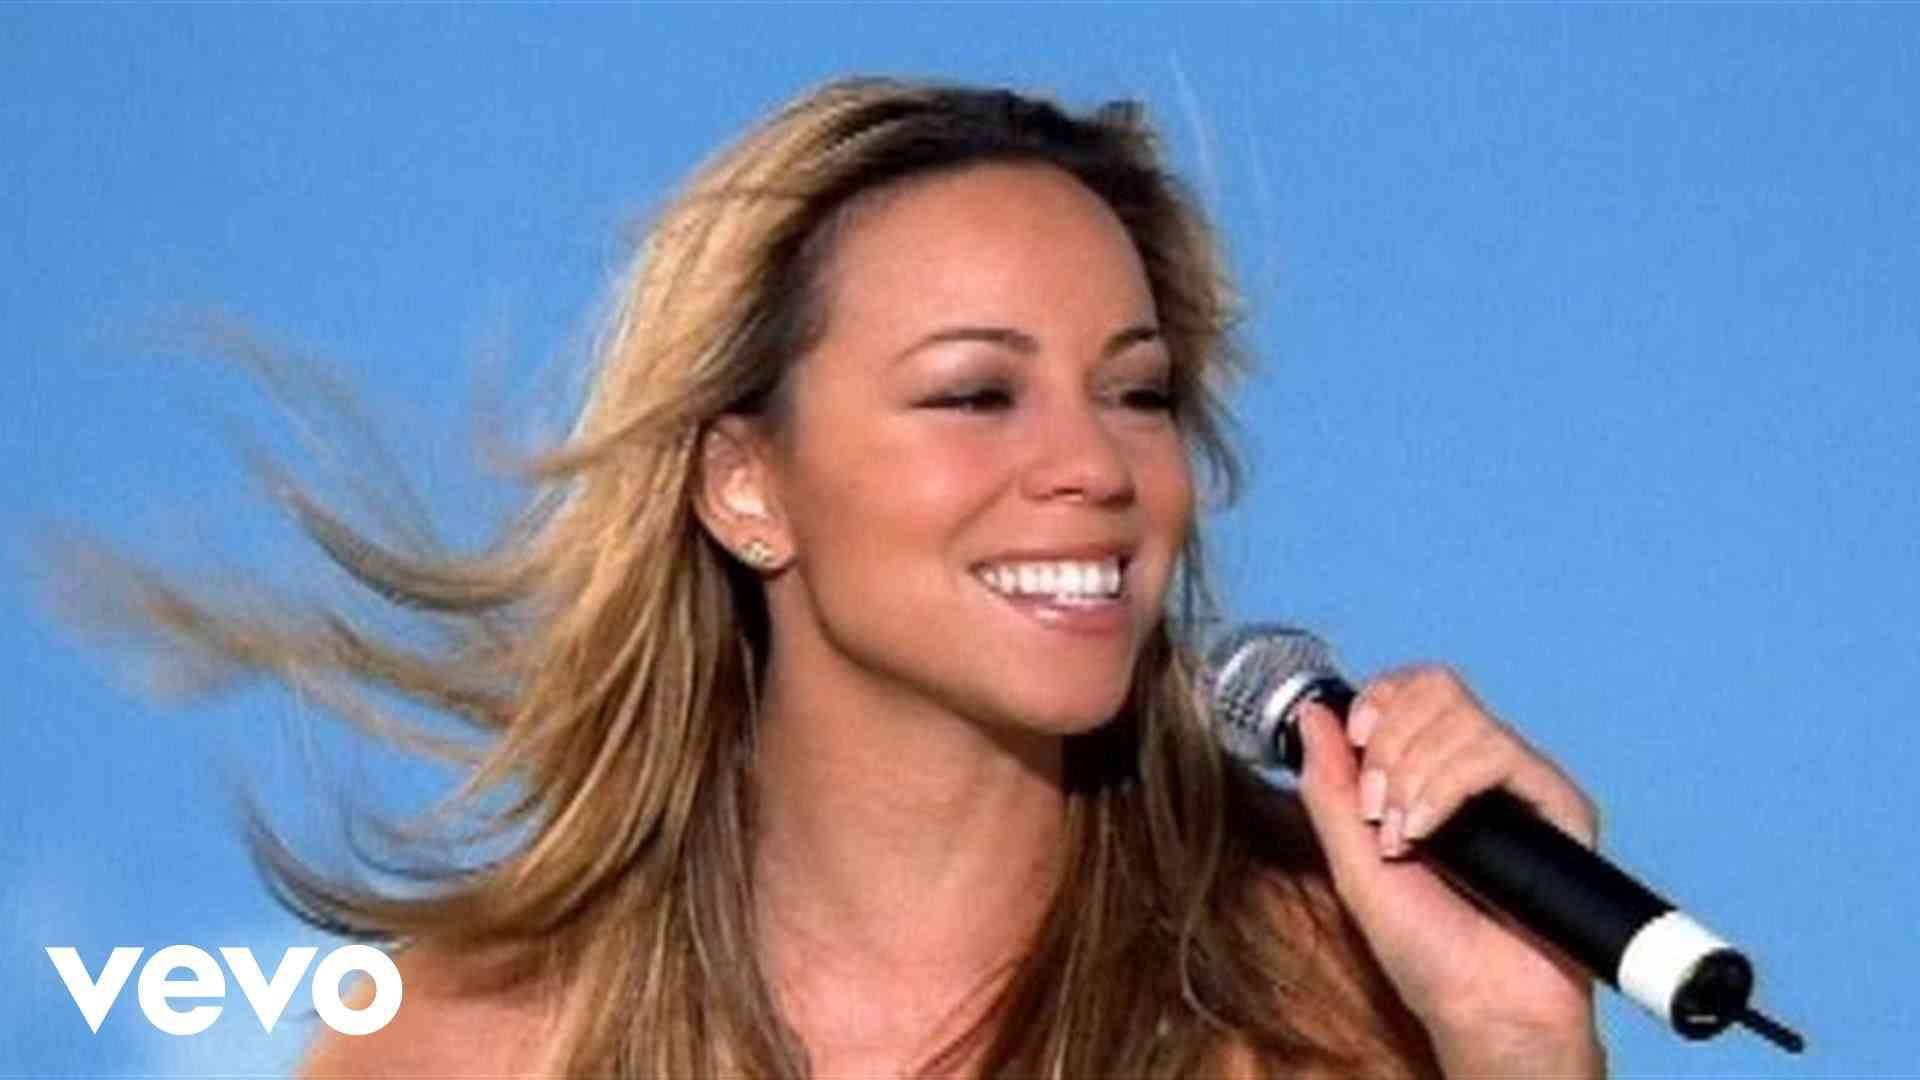 Mariah Carey, Joe, 98 Degrees - Thank God I Found You - YouTube